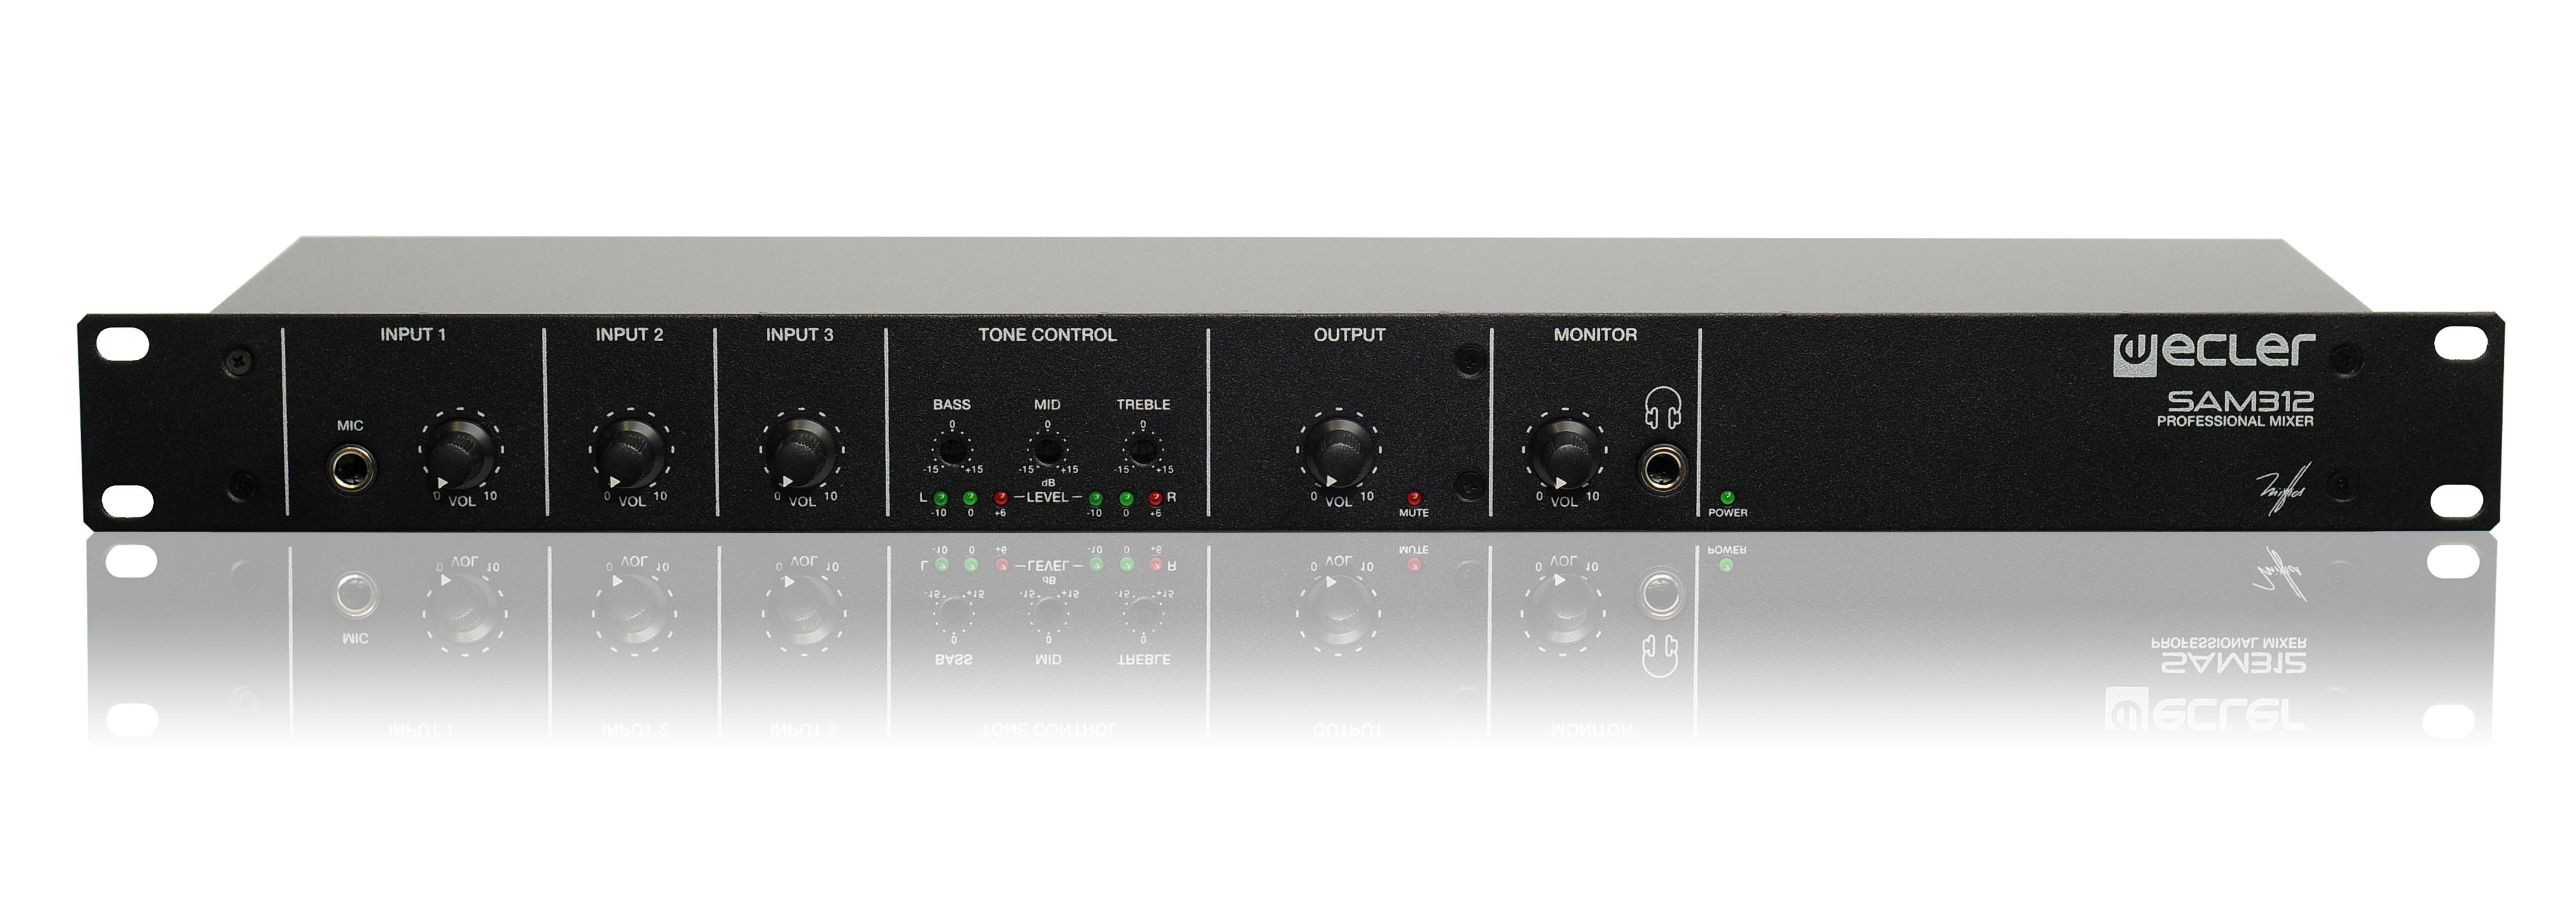 Ecler Sam312 Mezclador De Audio Anal U00f3gico Para Insatalaci U00f3n